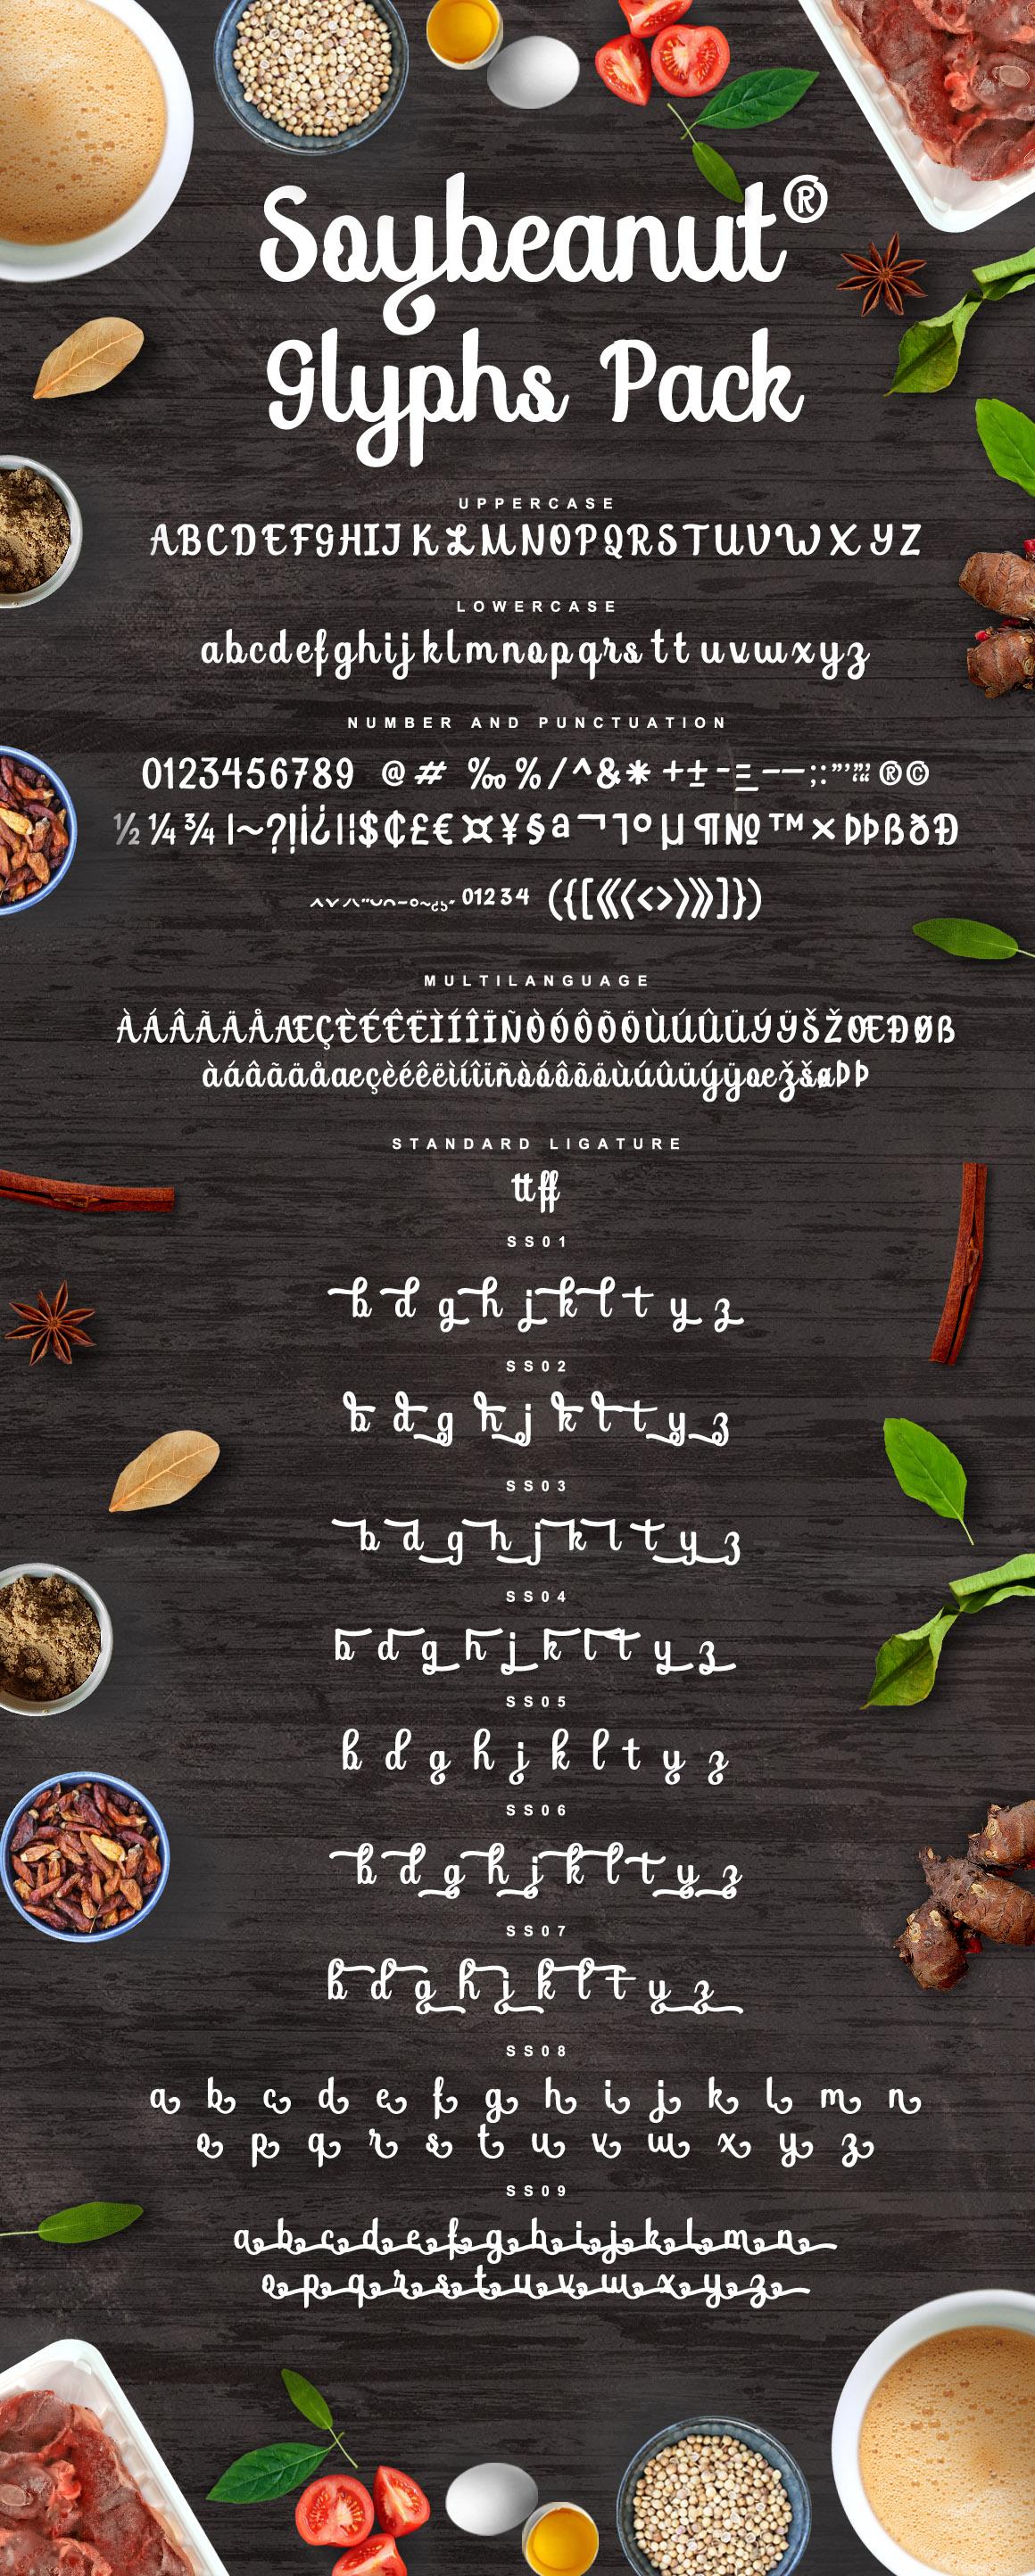 Soybeanut - Brush Script Font example image 10